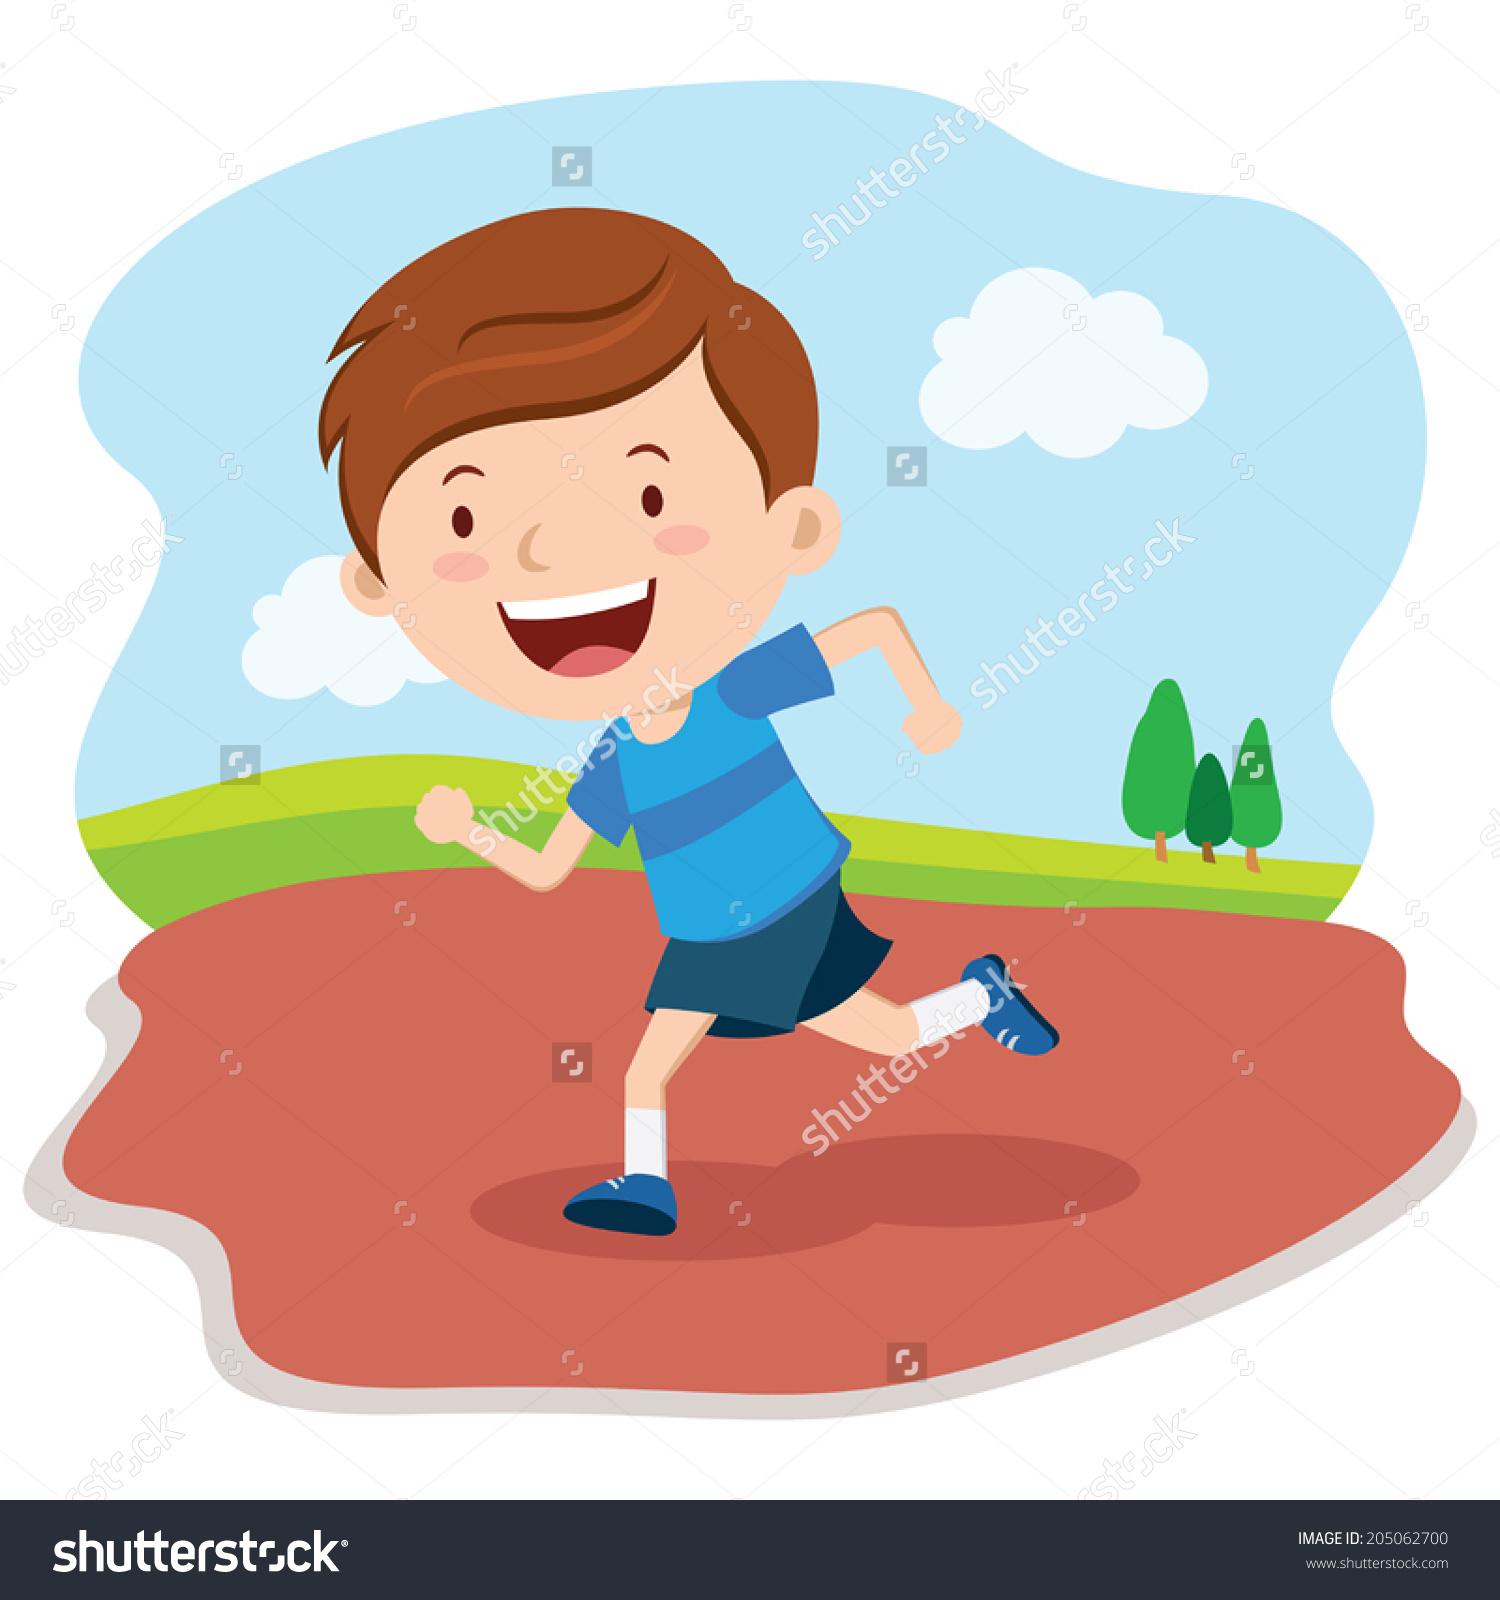 boy running clipartlook. Race clipart boys